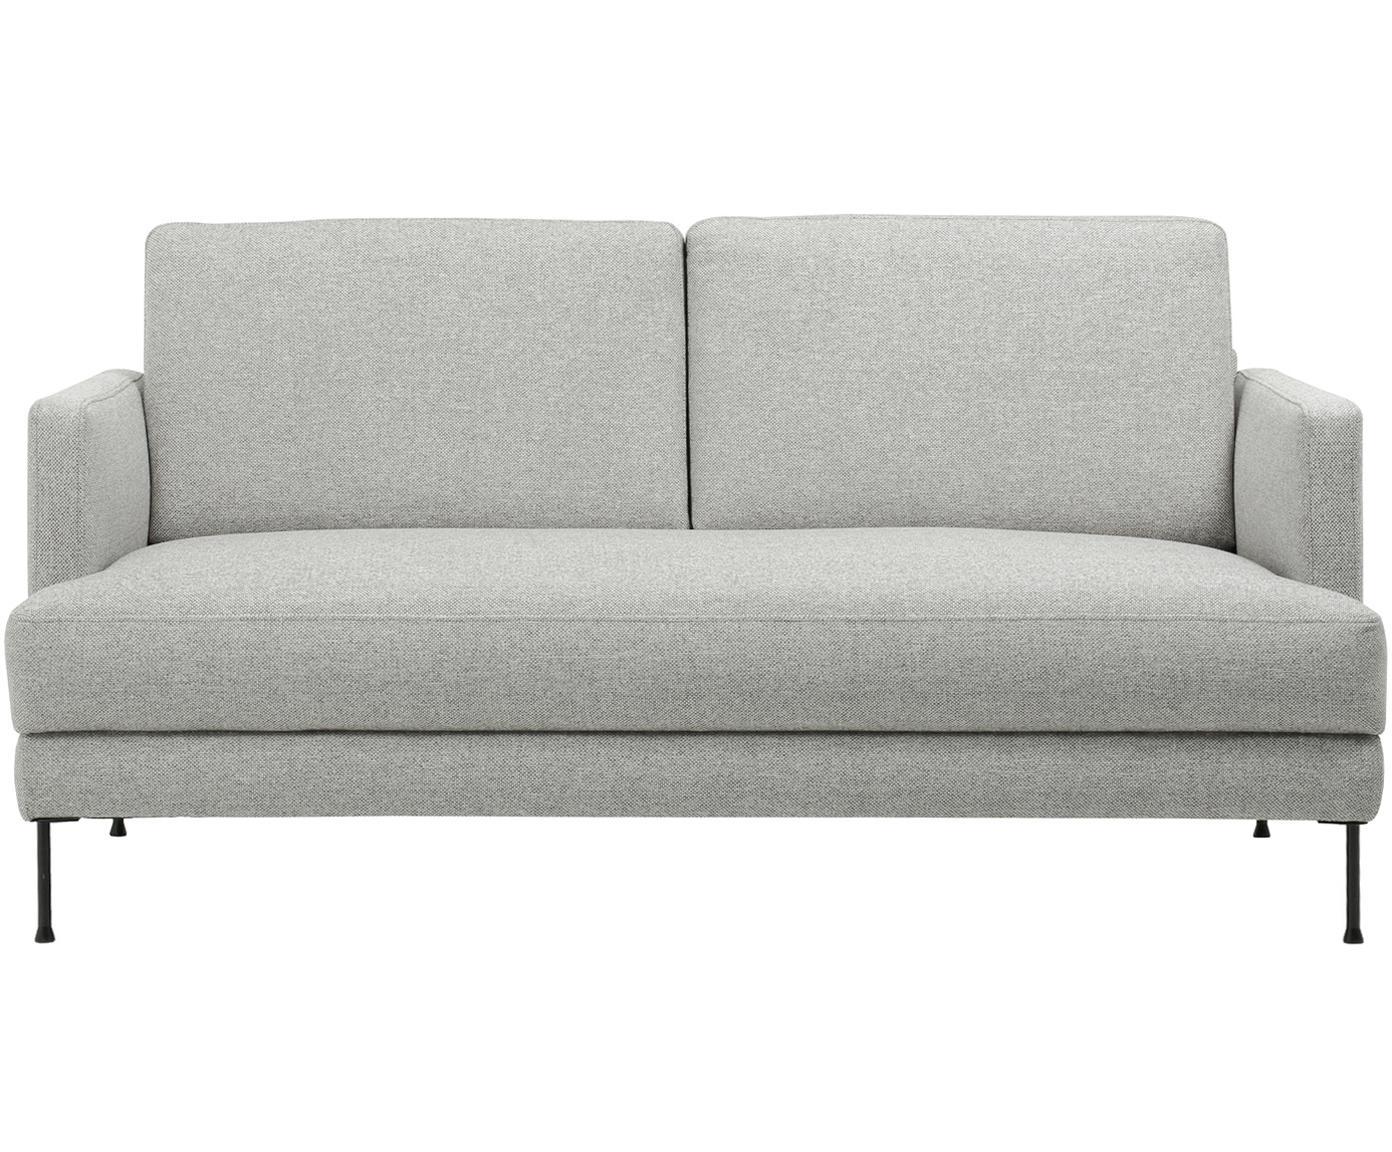 Sofa Fluente (2-Sitzer), Bezug: Polyester 45.000 Scheuert, Gestell: Holz, Webstoff Hellgrau, 168 x 85 cm